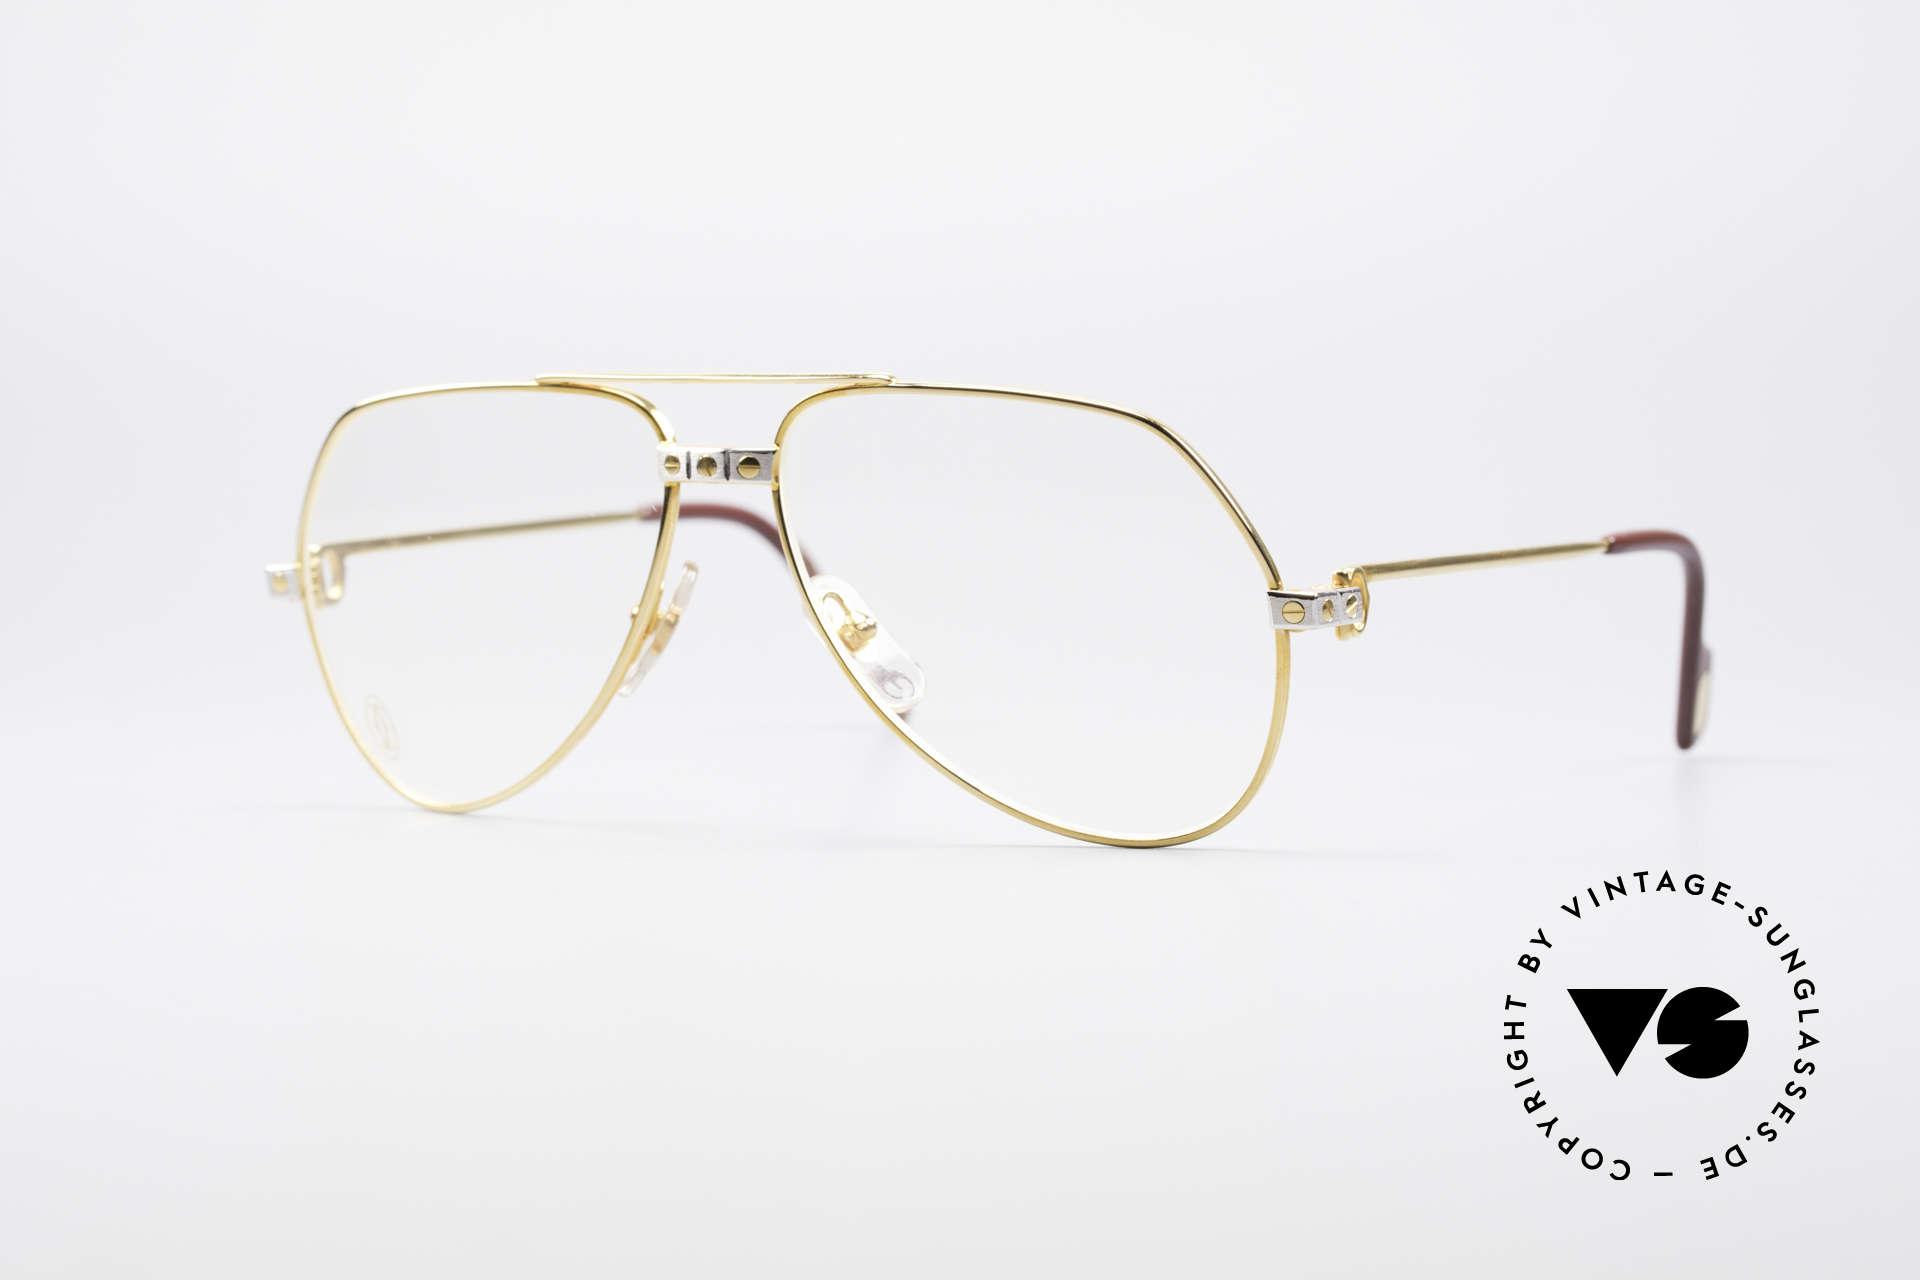 Cartier Vendome Santos - S James Bond Eyeglasses 1980's, Vendome = the most famous eyewear design by CARTIER, Made for Men and Women